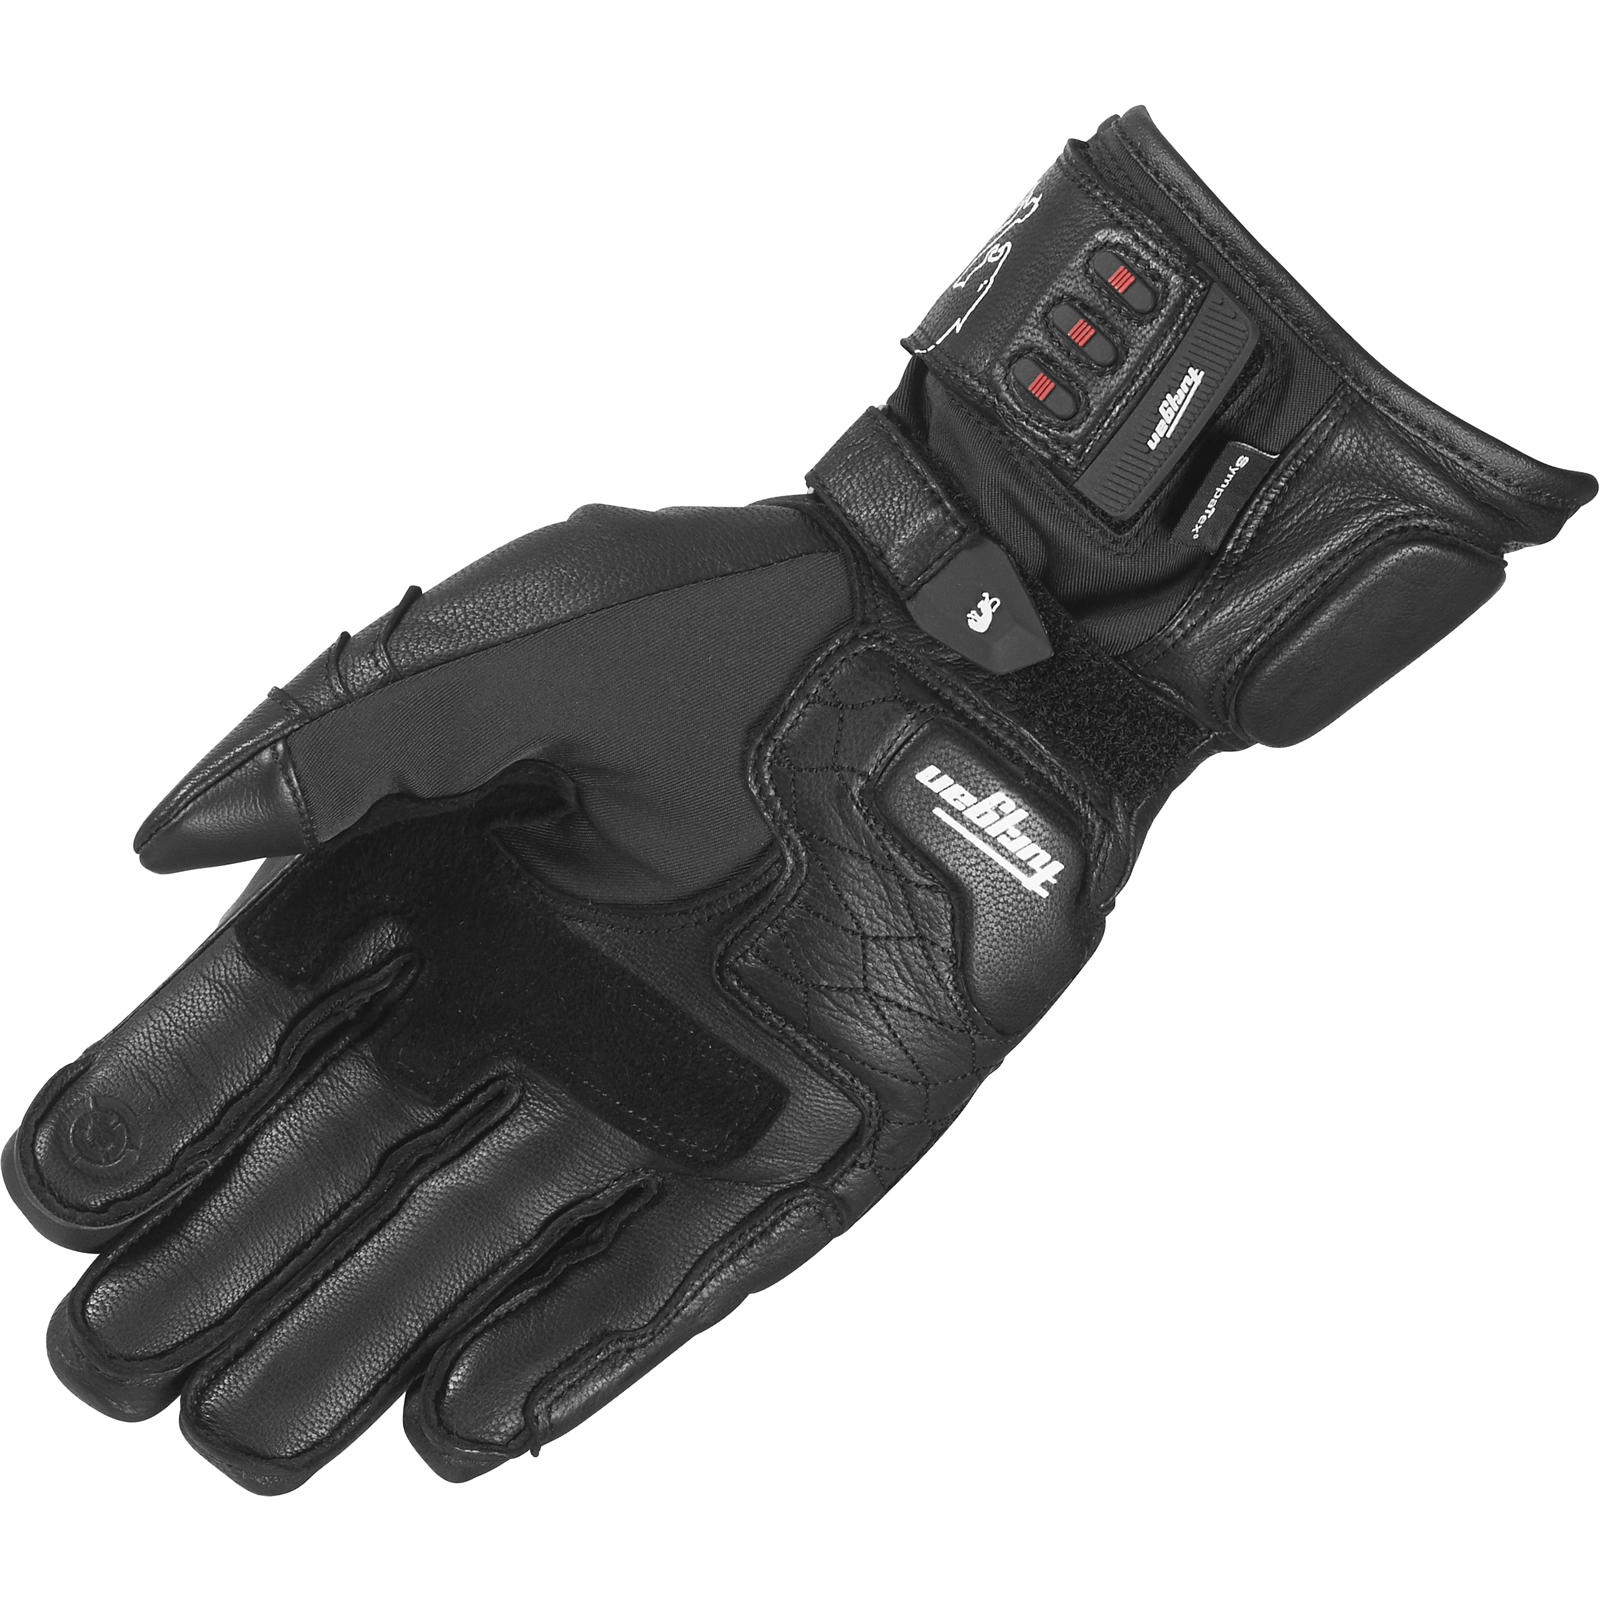 Furygan-Mercury-Sympatex-Leather-Motorcycle-Gloves-All-Season-Sports-Motorbike